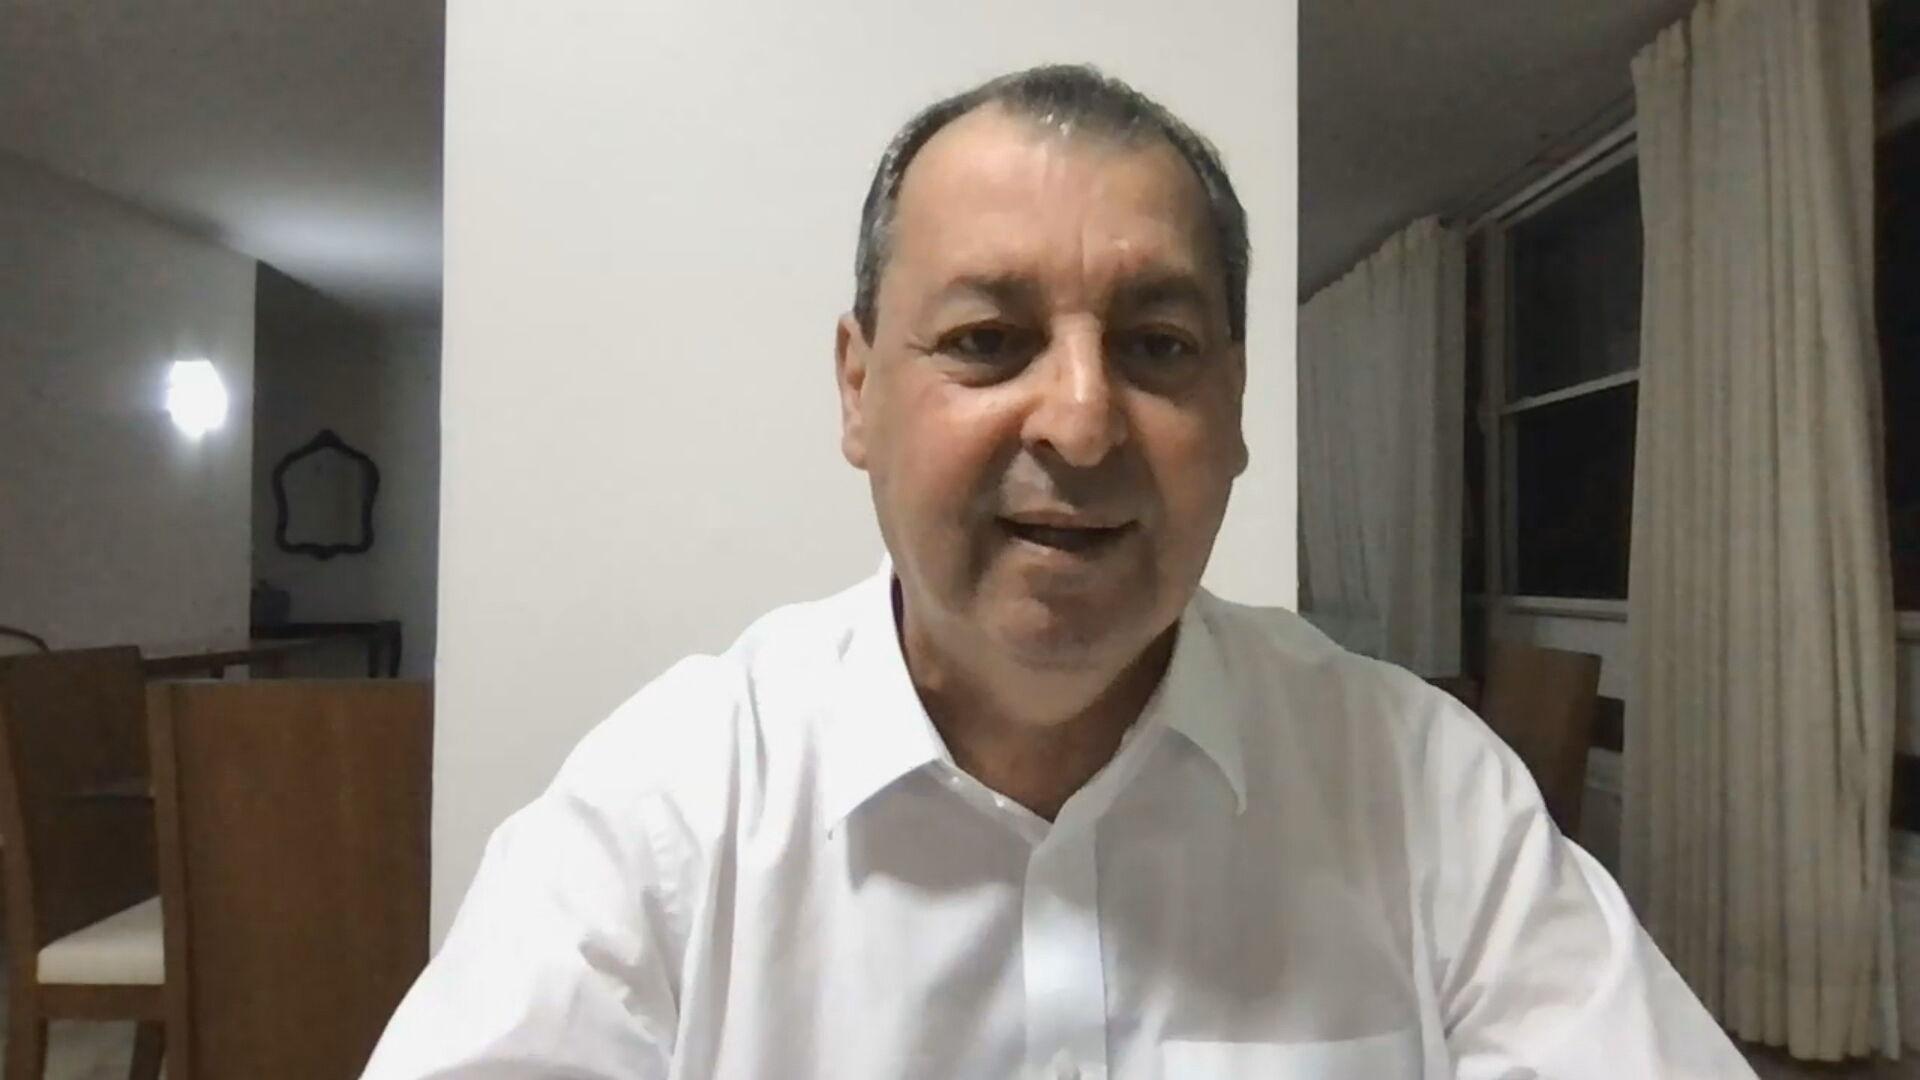 Senador Omar Aziz (PSD-AM), presidente da CPI da Pandemia, falou sobre próximos